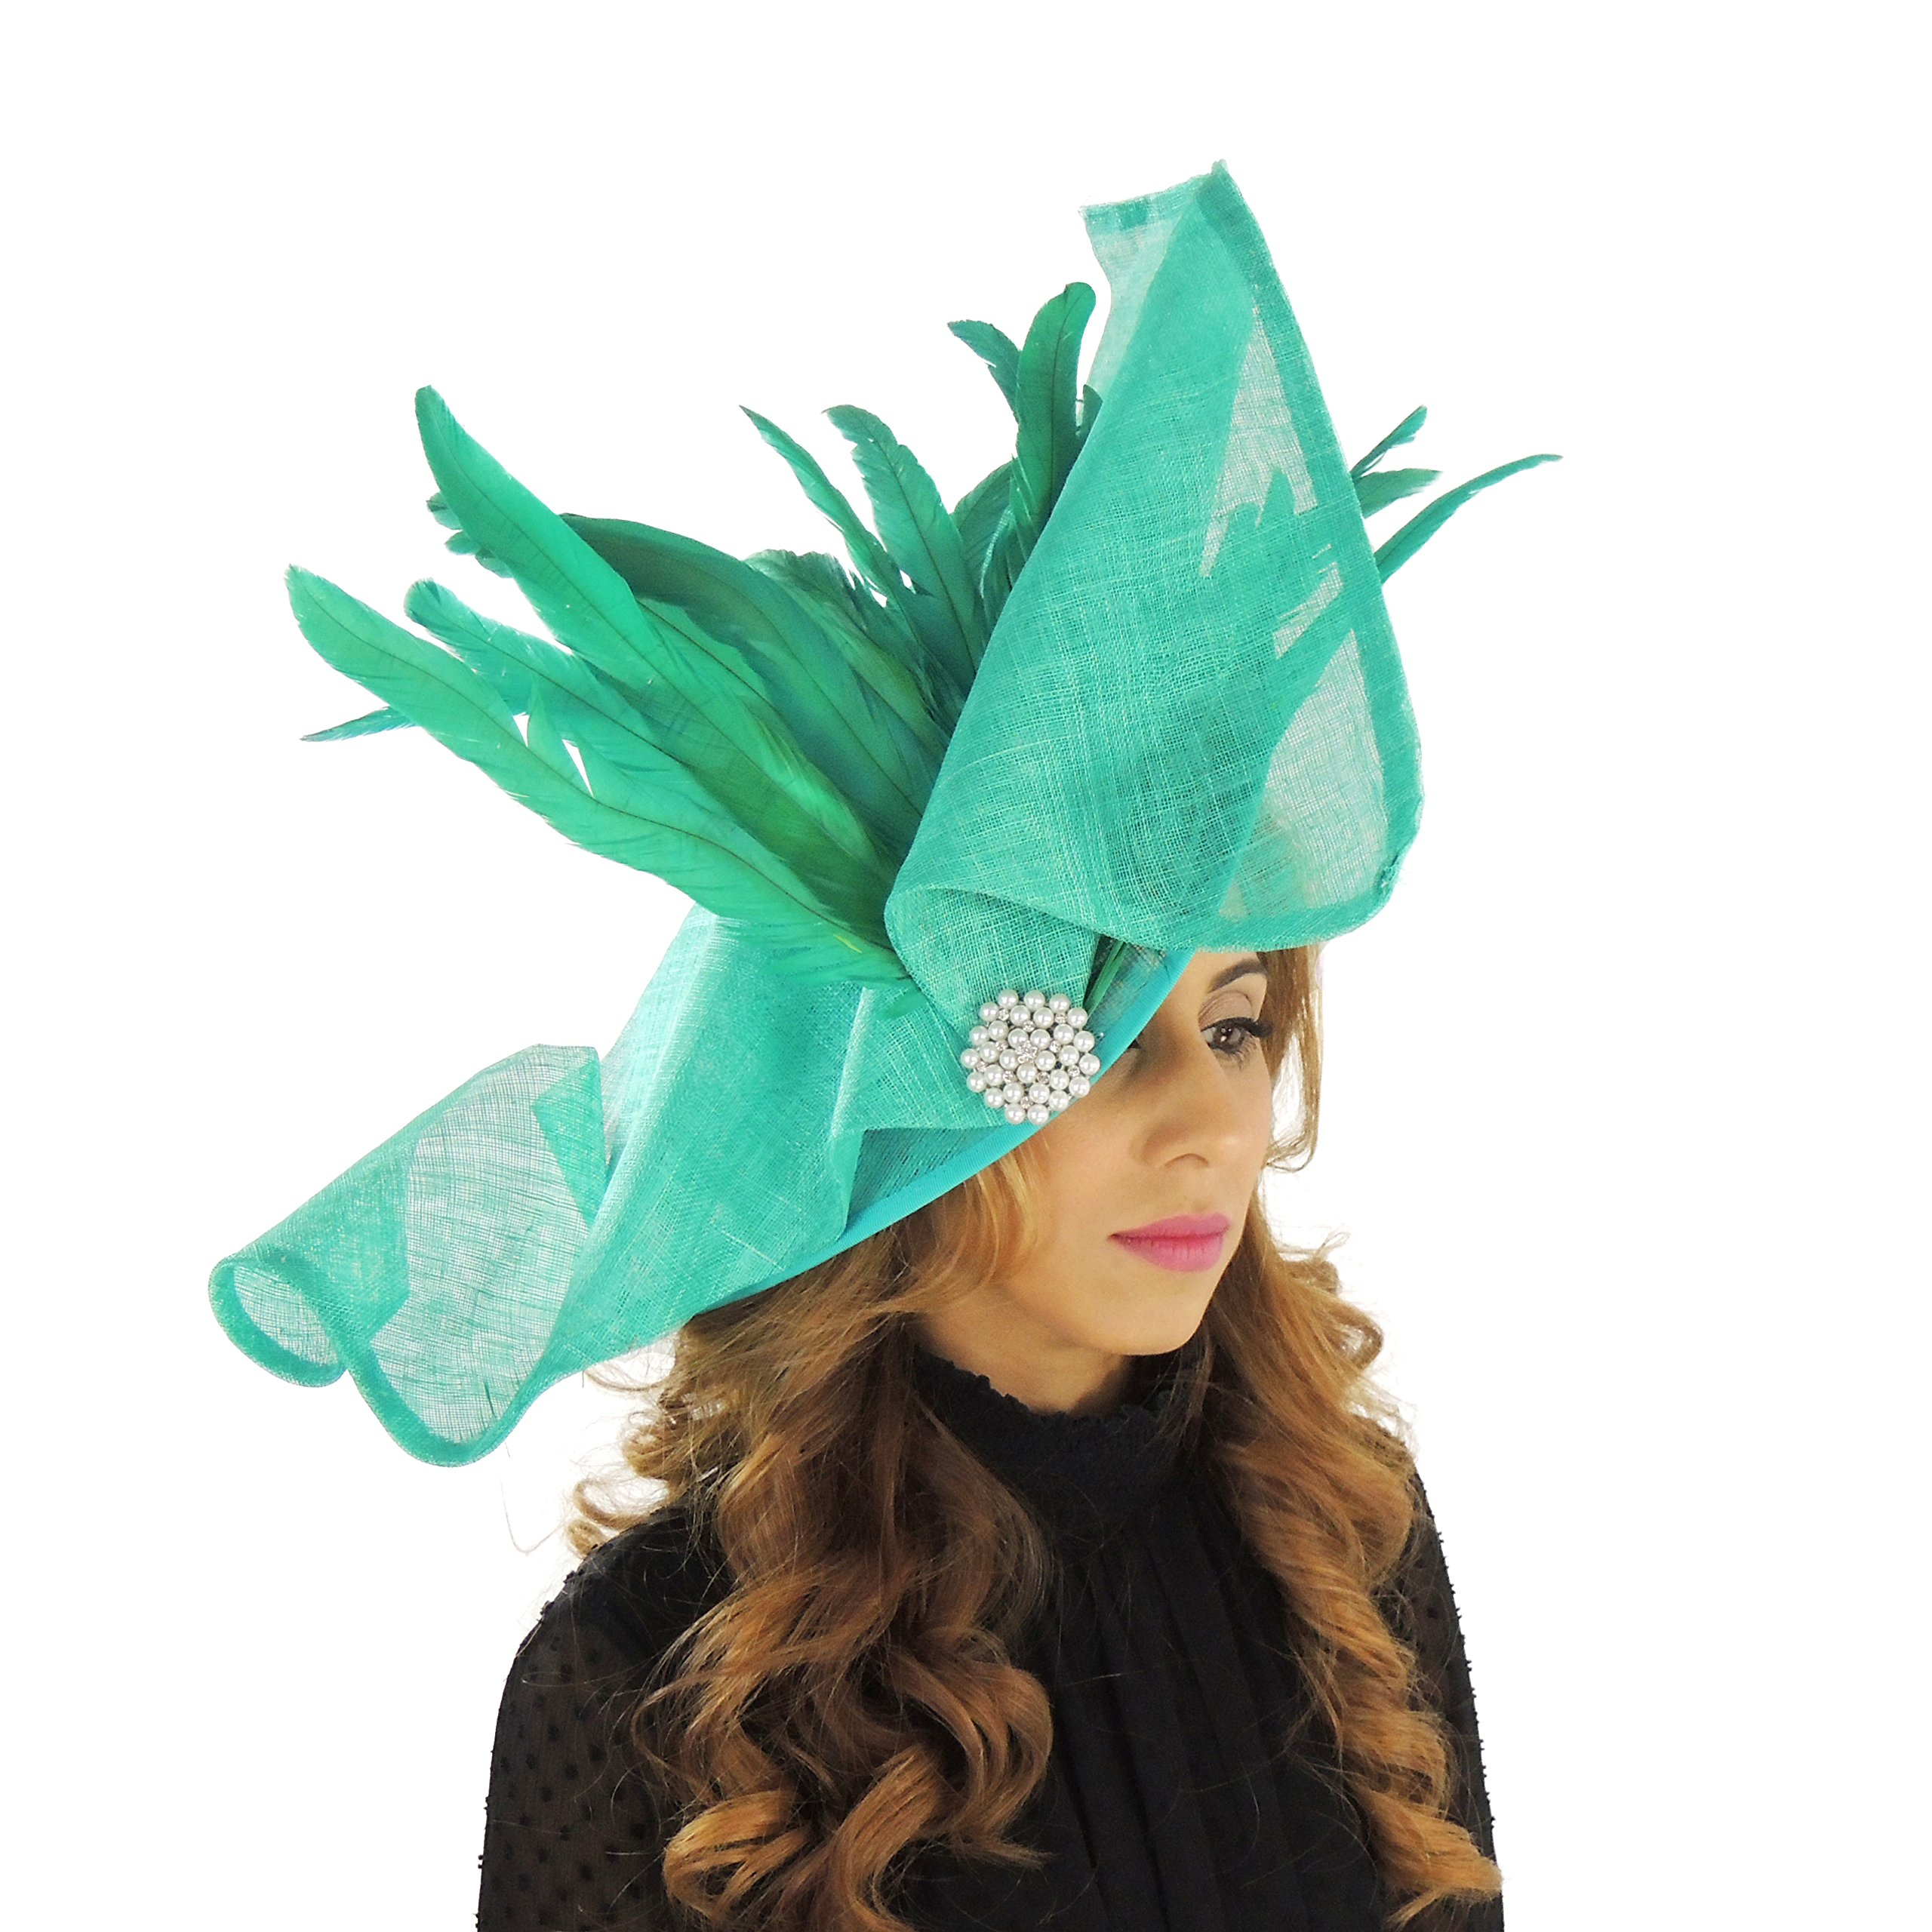 Hats By Cressida Ladies Wedding Races Ascot Derby Fascinator Headband Large Jade Green